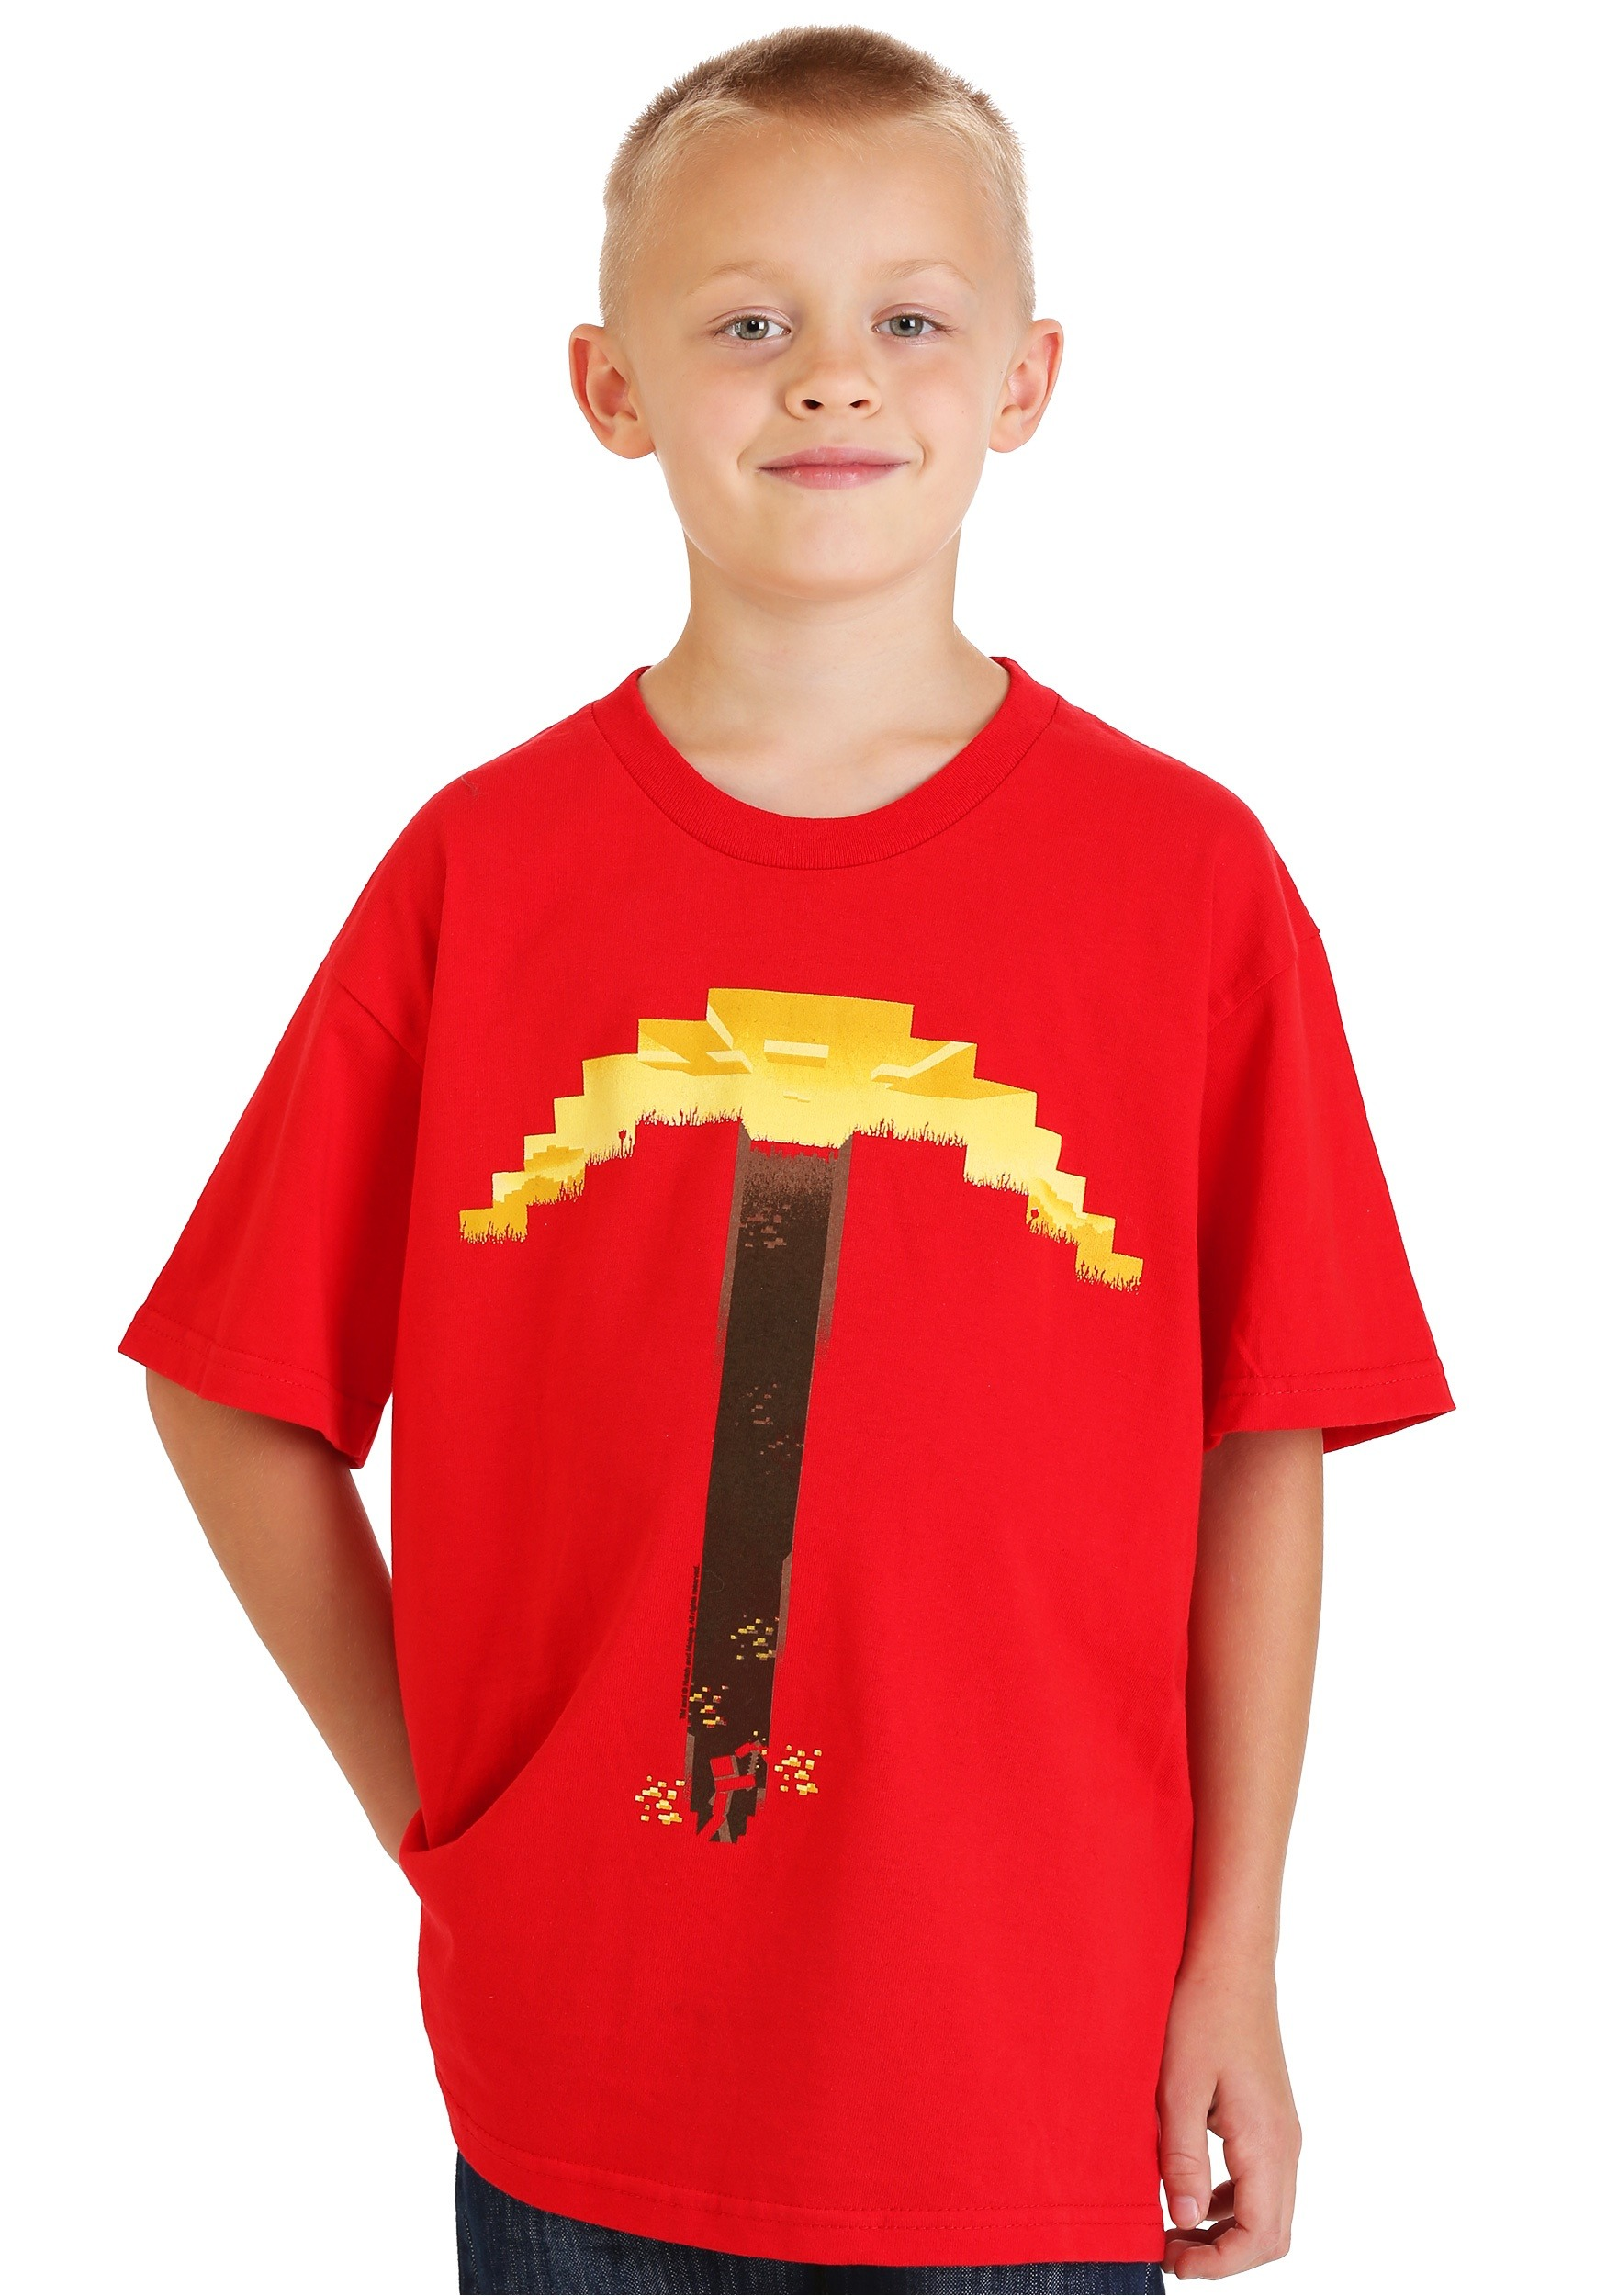 Red T-shirt Minecraft Digitized Pickaxe